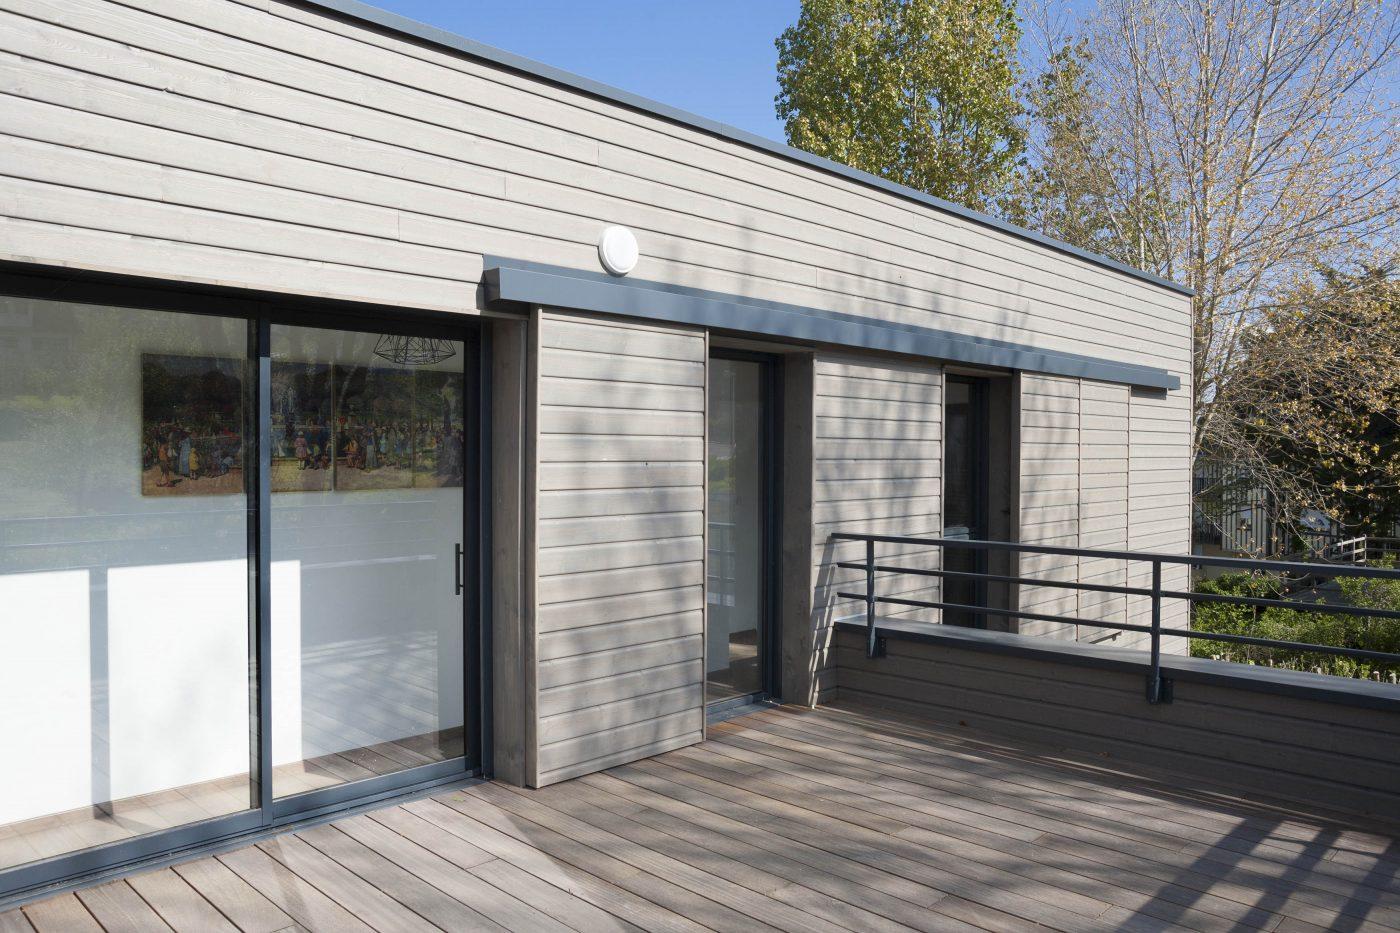 Philippe_Zerbib_Architecte_construction_maisons_ossature_bois_projet_maison_benhamou_MG_8465